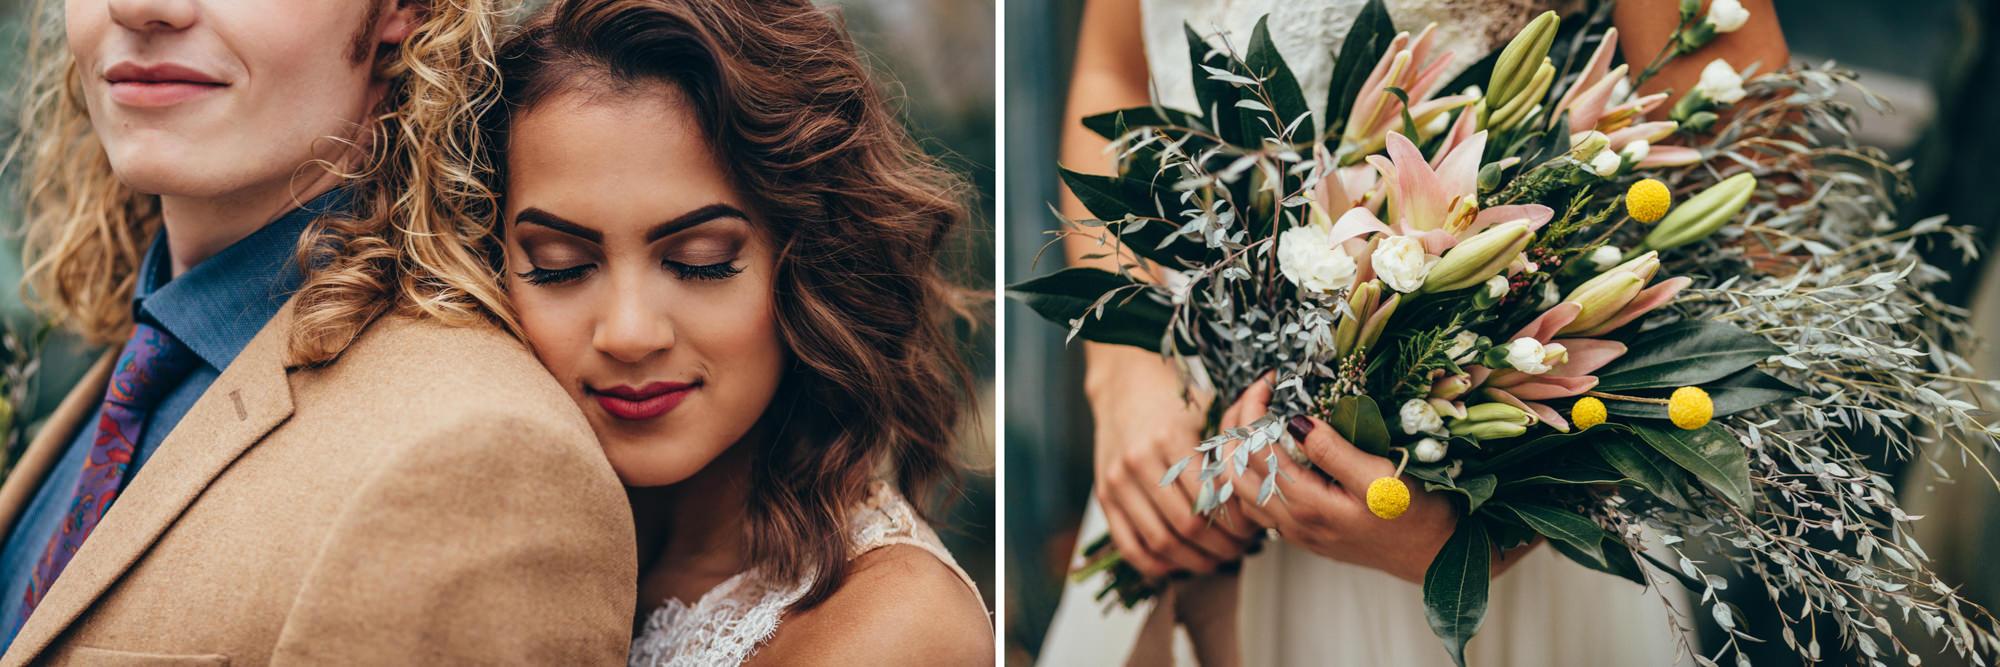 greenhouse-wedding.jpg